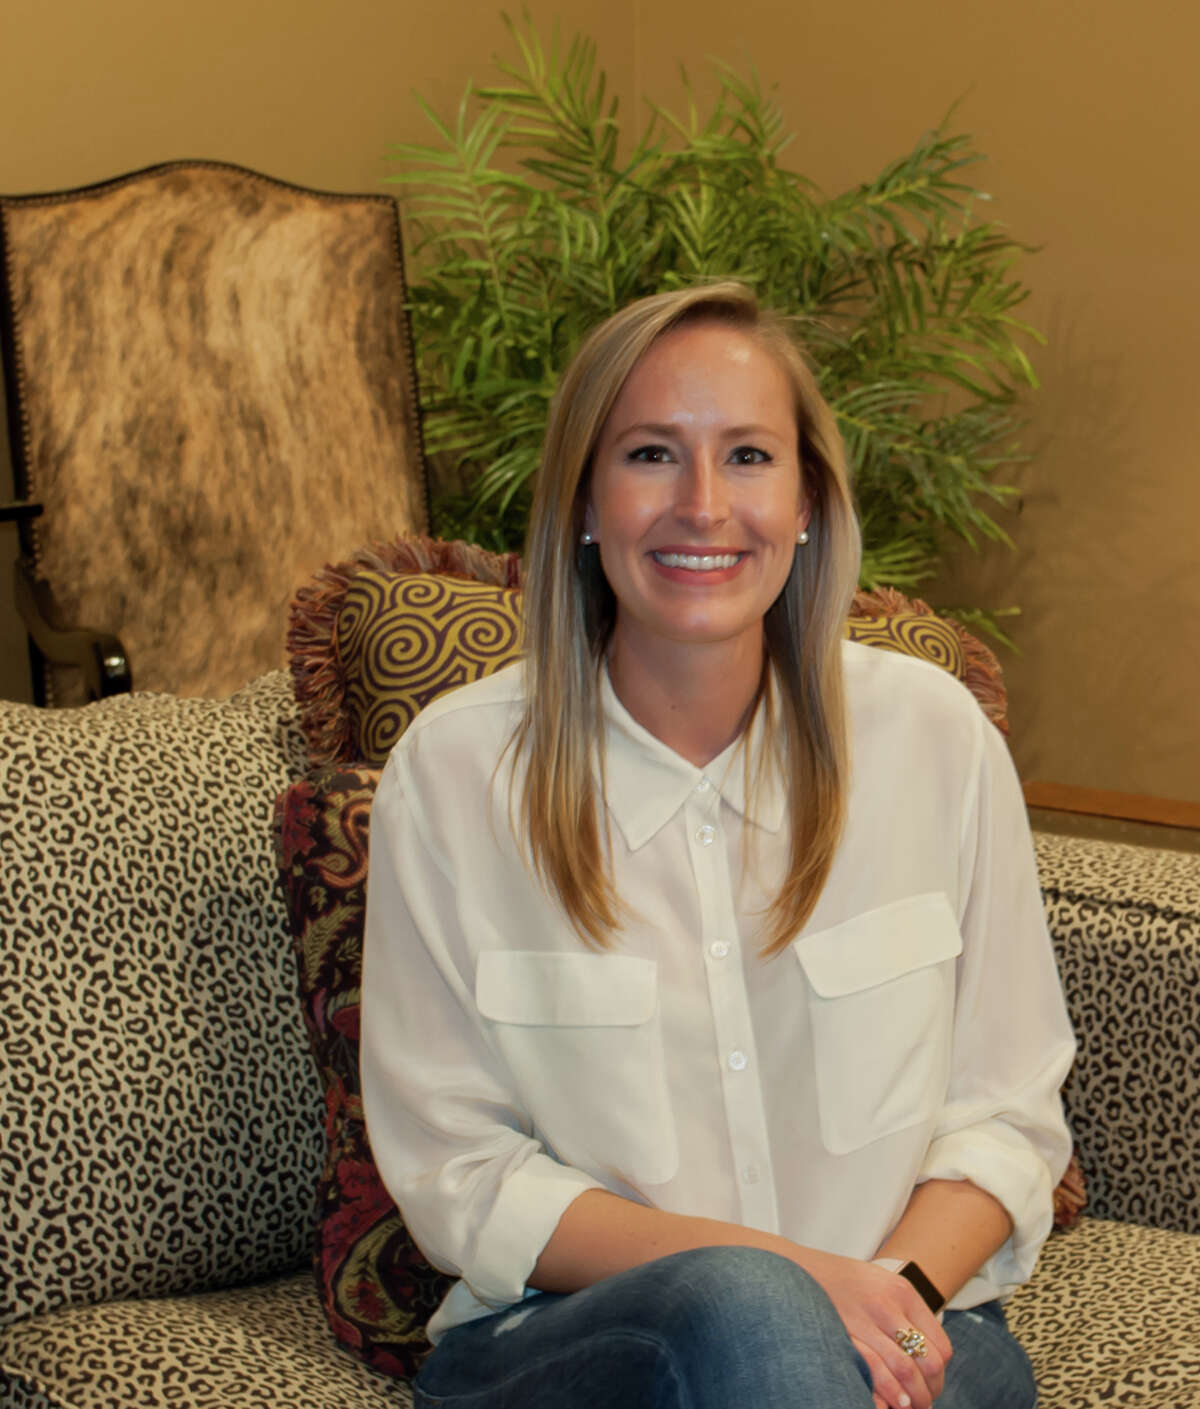 Allison Tull, 28, Rock the Desert Ministries, Inc., Director of Development & Ministry Operations